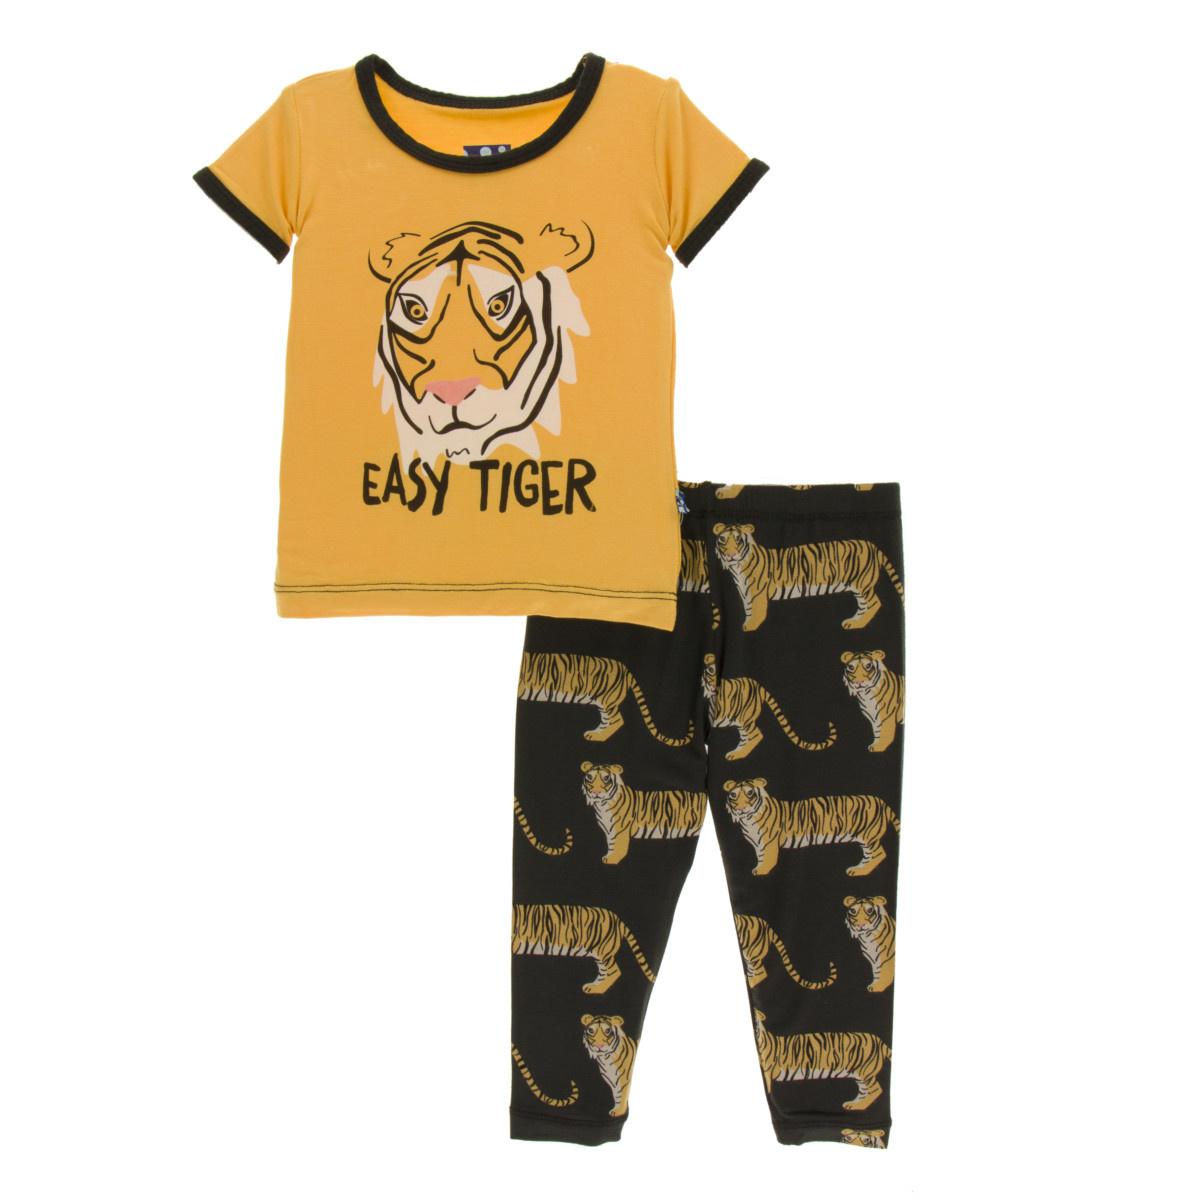 KicKee Pants KicKee Pants Short Sleeve Pajama Set - Zebra Tiger